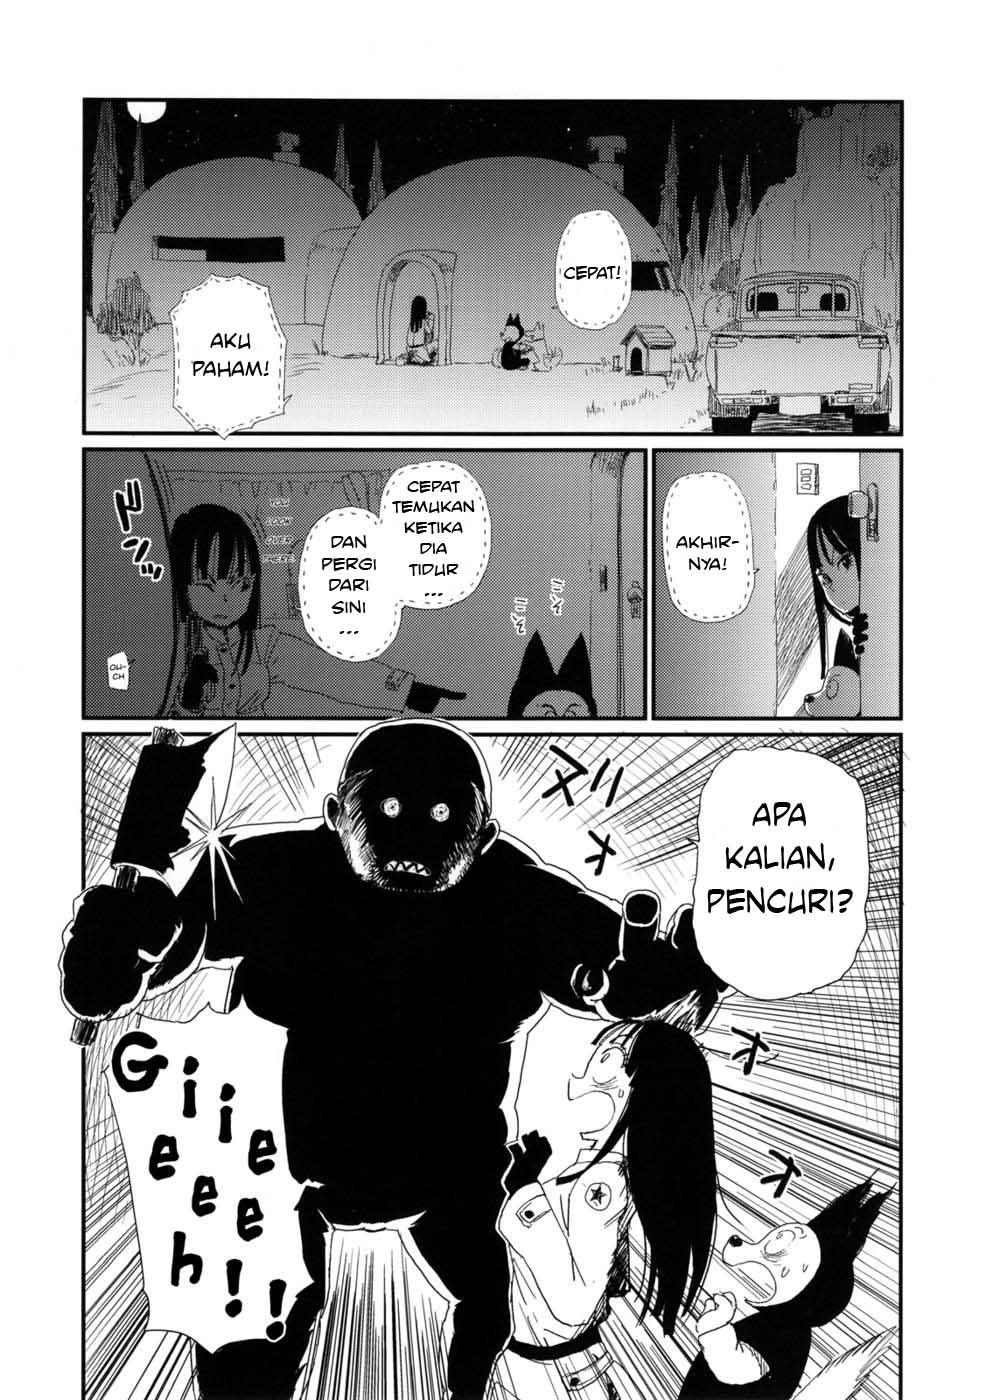 Komik Hentai | Manga Hentai | Komik XXX | Komik Porno | Komik SEX | komik dewasa | komik ngentot | komik hentai sex | komik sex naruto | komik sex one piece | komik hentai manga | komik sex hot dragon ball hentai sex